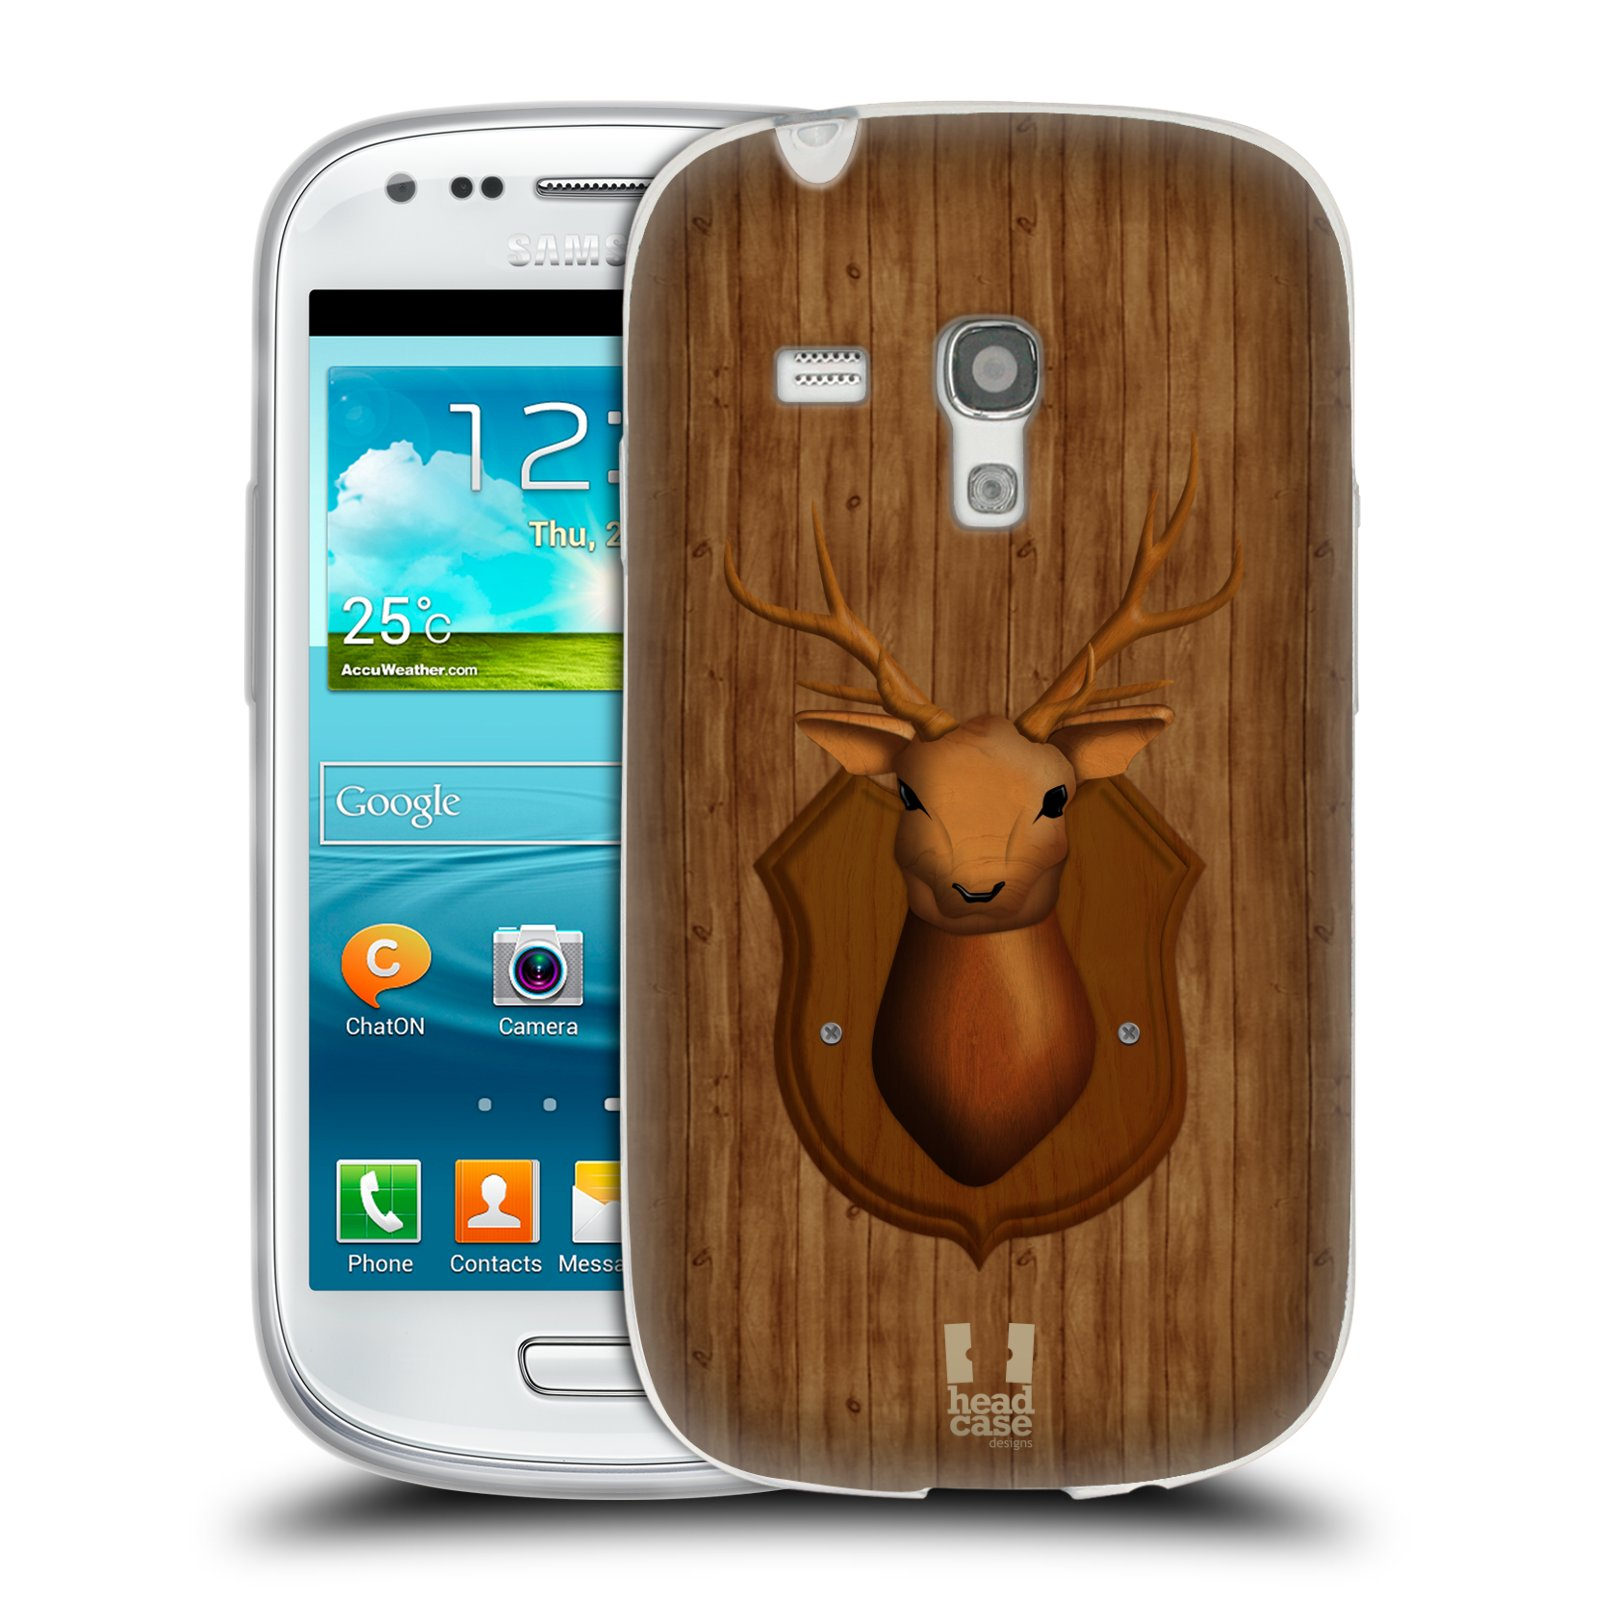 HEAD CASE silikonový obal na mobil Samsung Galaxy S3 MINI i8190 vzor Dřevěné umění 2 JELEN TROFEJ